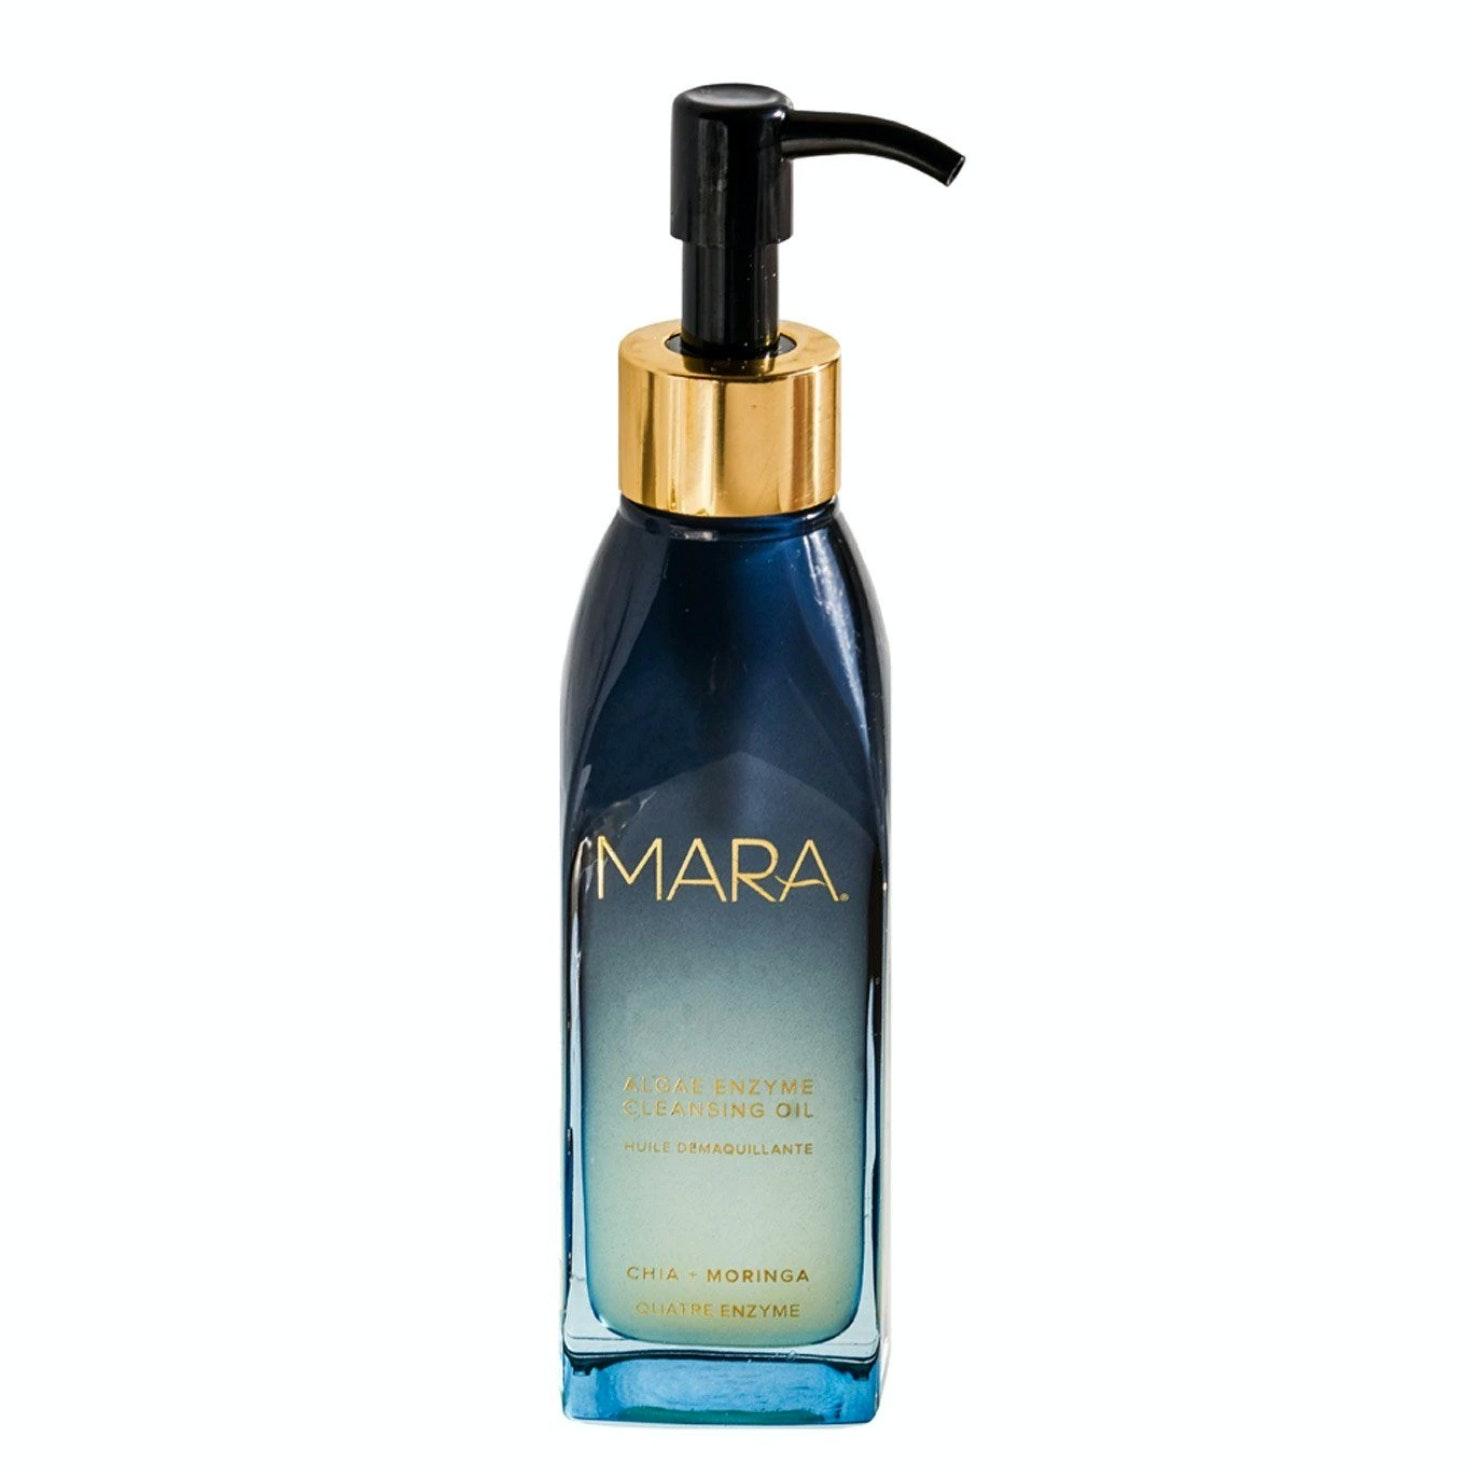 MARA® Chia + Moringa Algae Enzyme Cleansing Oil